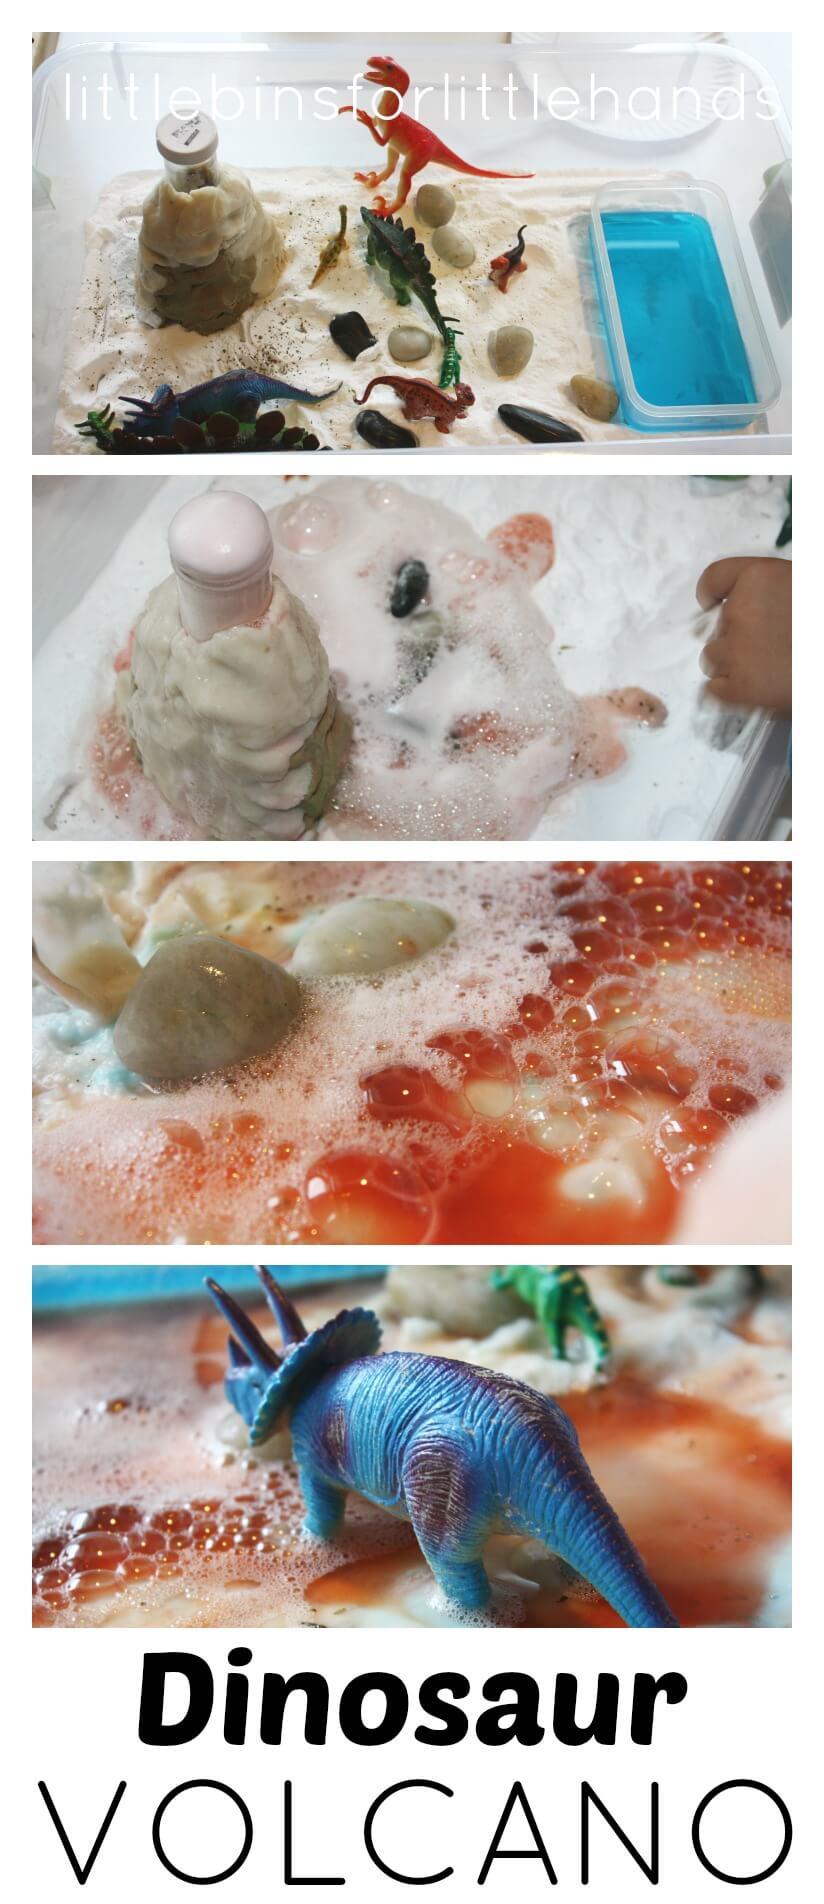 preschool dinosaur activities sensory play ideas. Black Bedroom Furniture Sets. Home Design Ideas